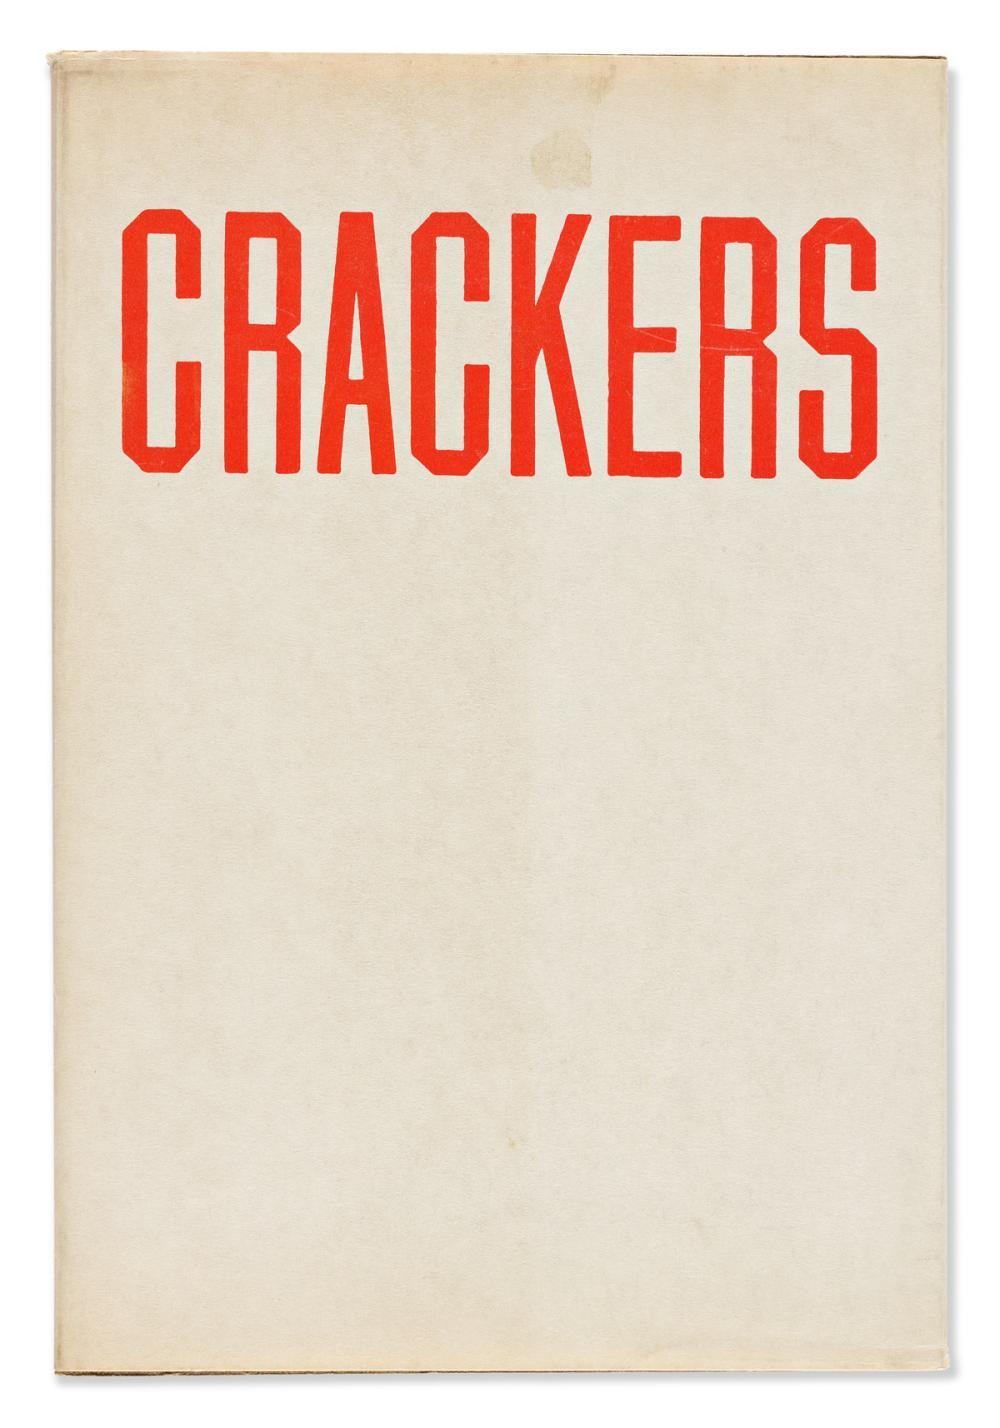 RUSCHA, EDWARD. Crackers.